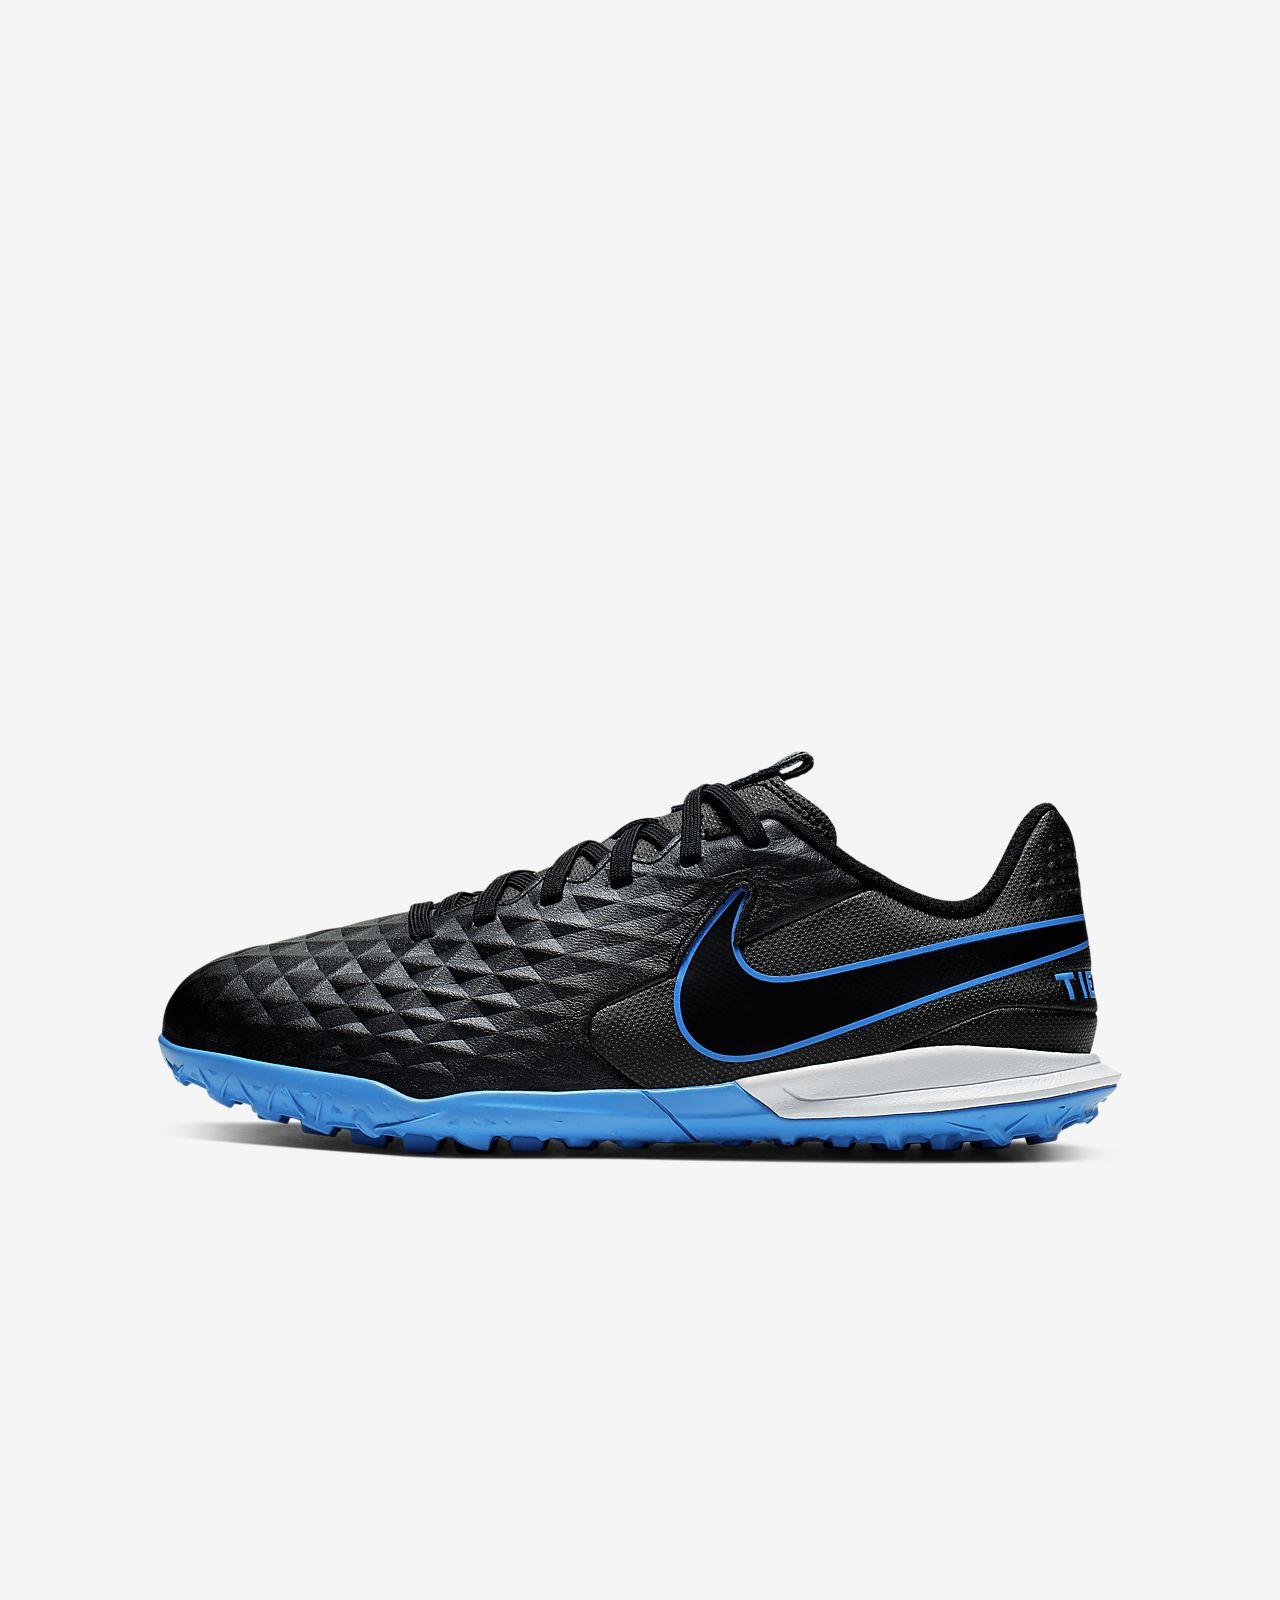 Nike Jr. Tiempo Legend 8 Academy TF Little/Big Kids' Artificial-Turf Soccer Shoe